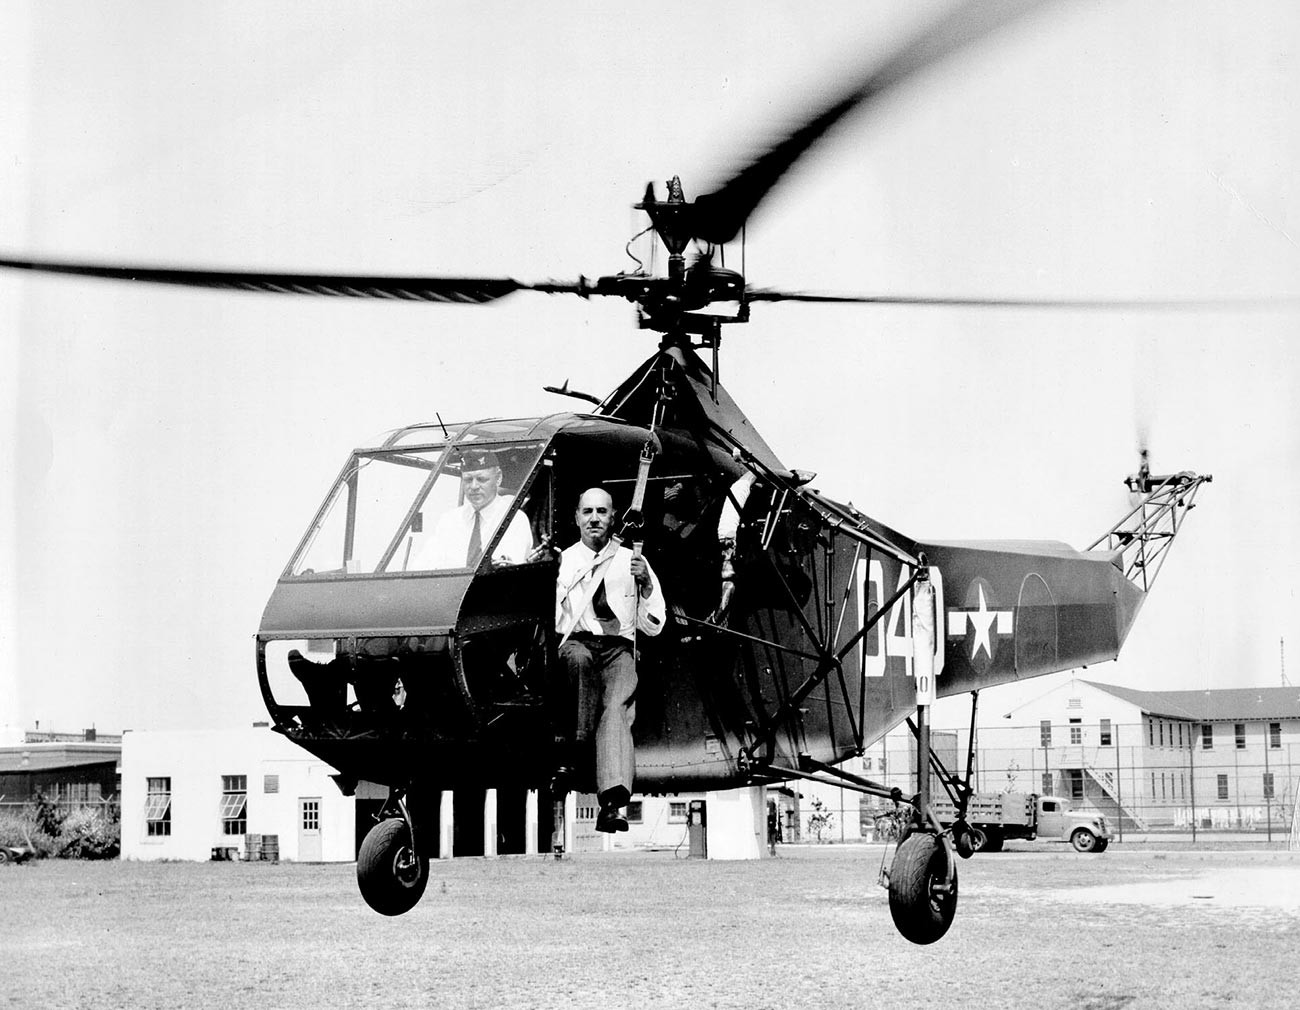 Командант обалске страже САД Френк А. Ериксон и Игор Сикорски у хеликоптеру Sikorski HNS-1 C.G.